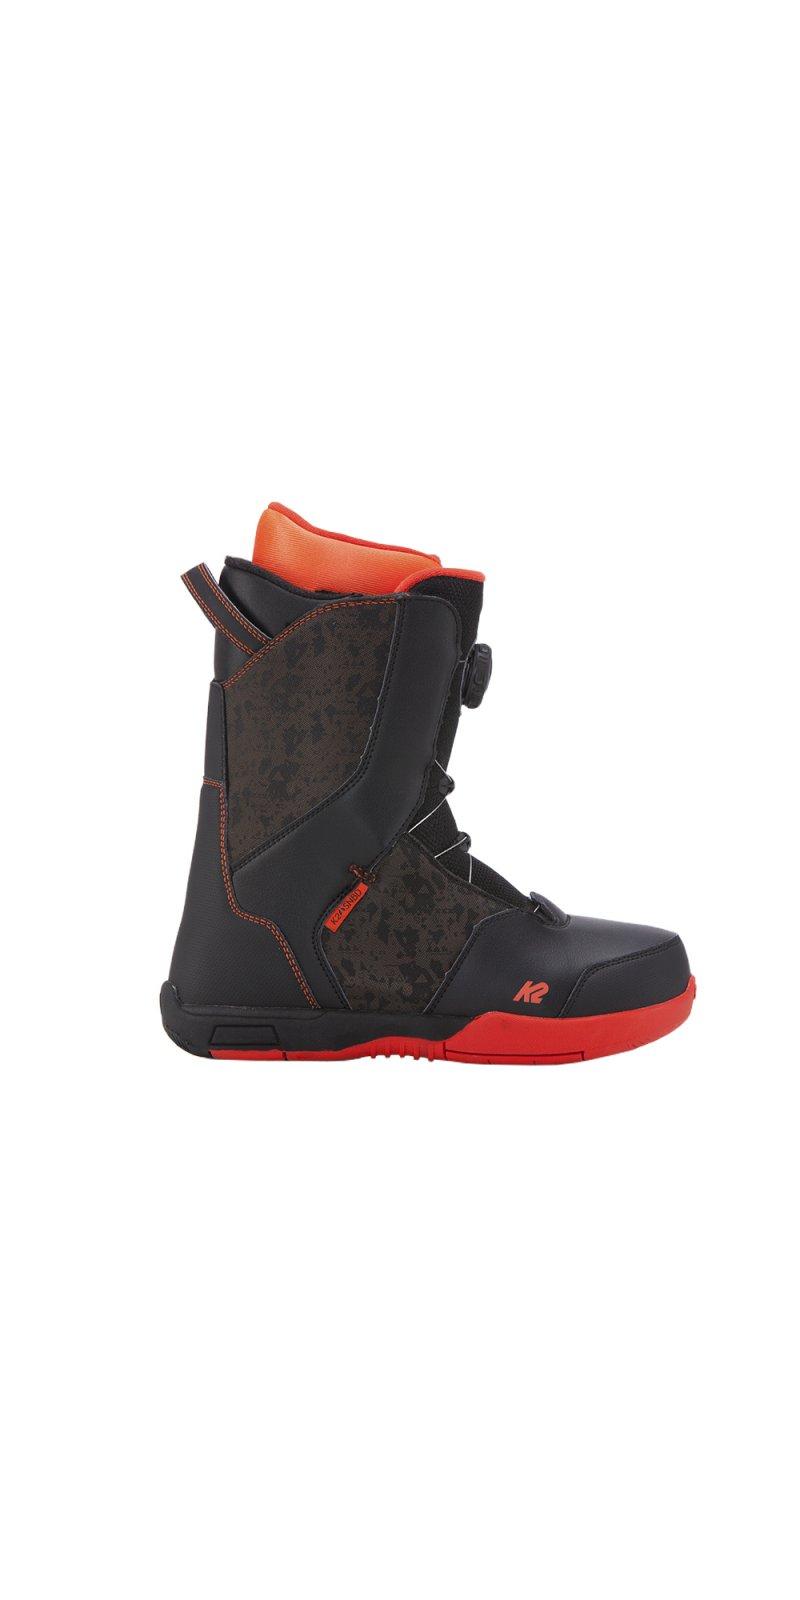 17/18 K2 Vandal Snowboard Boots